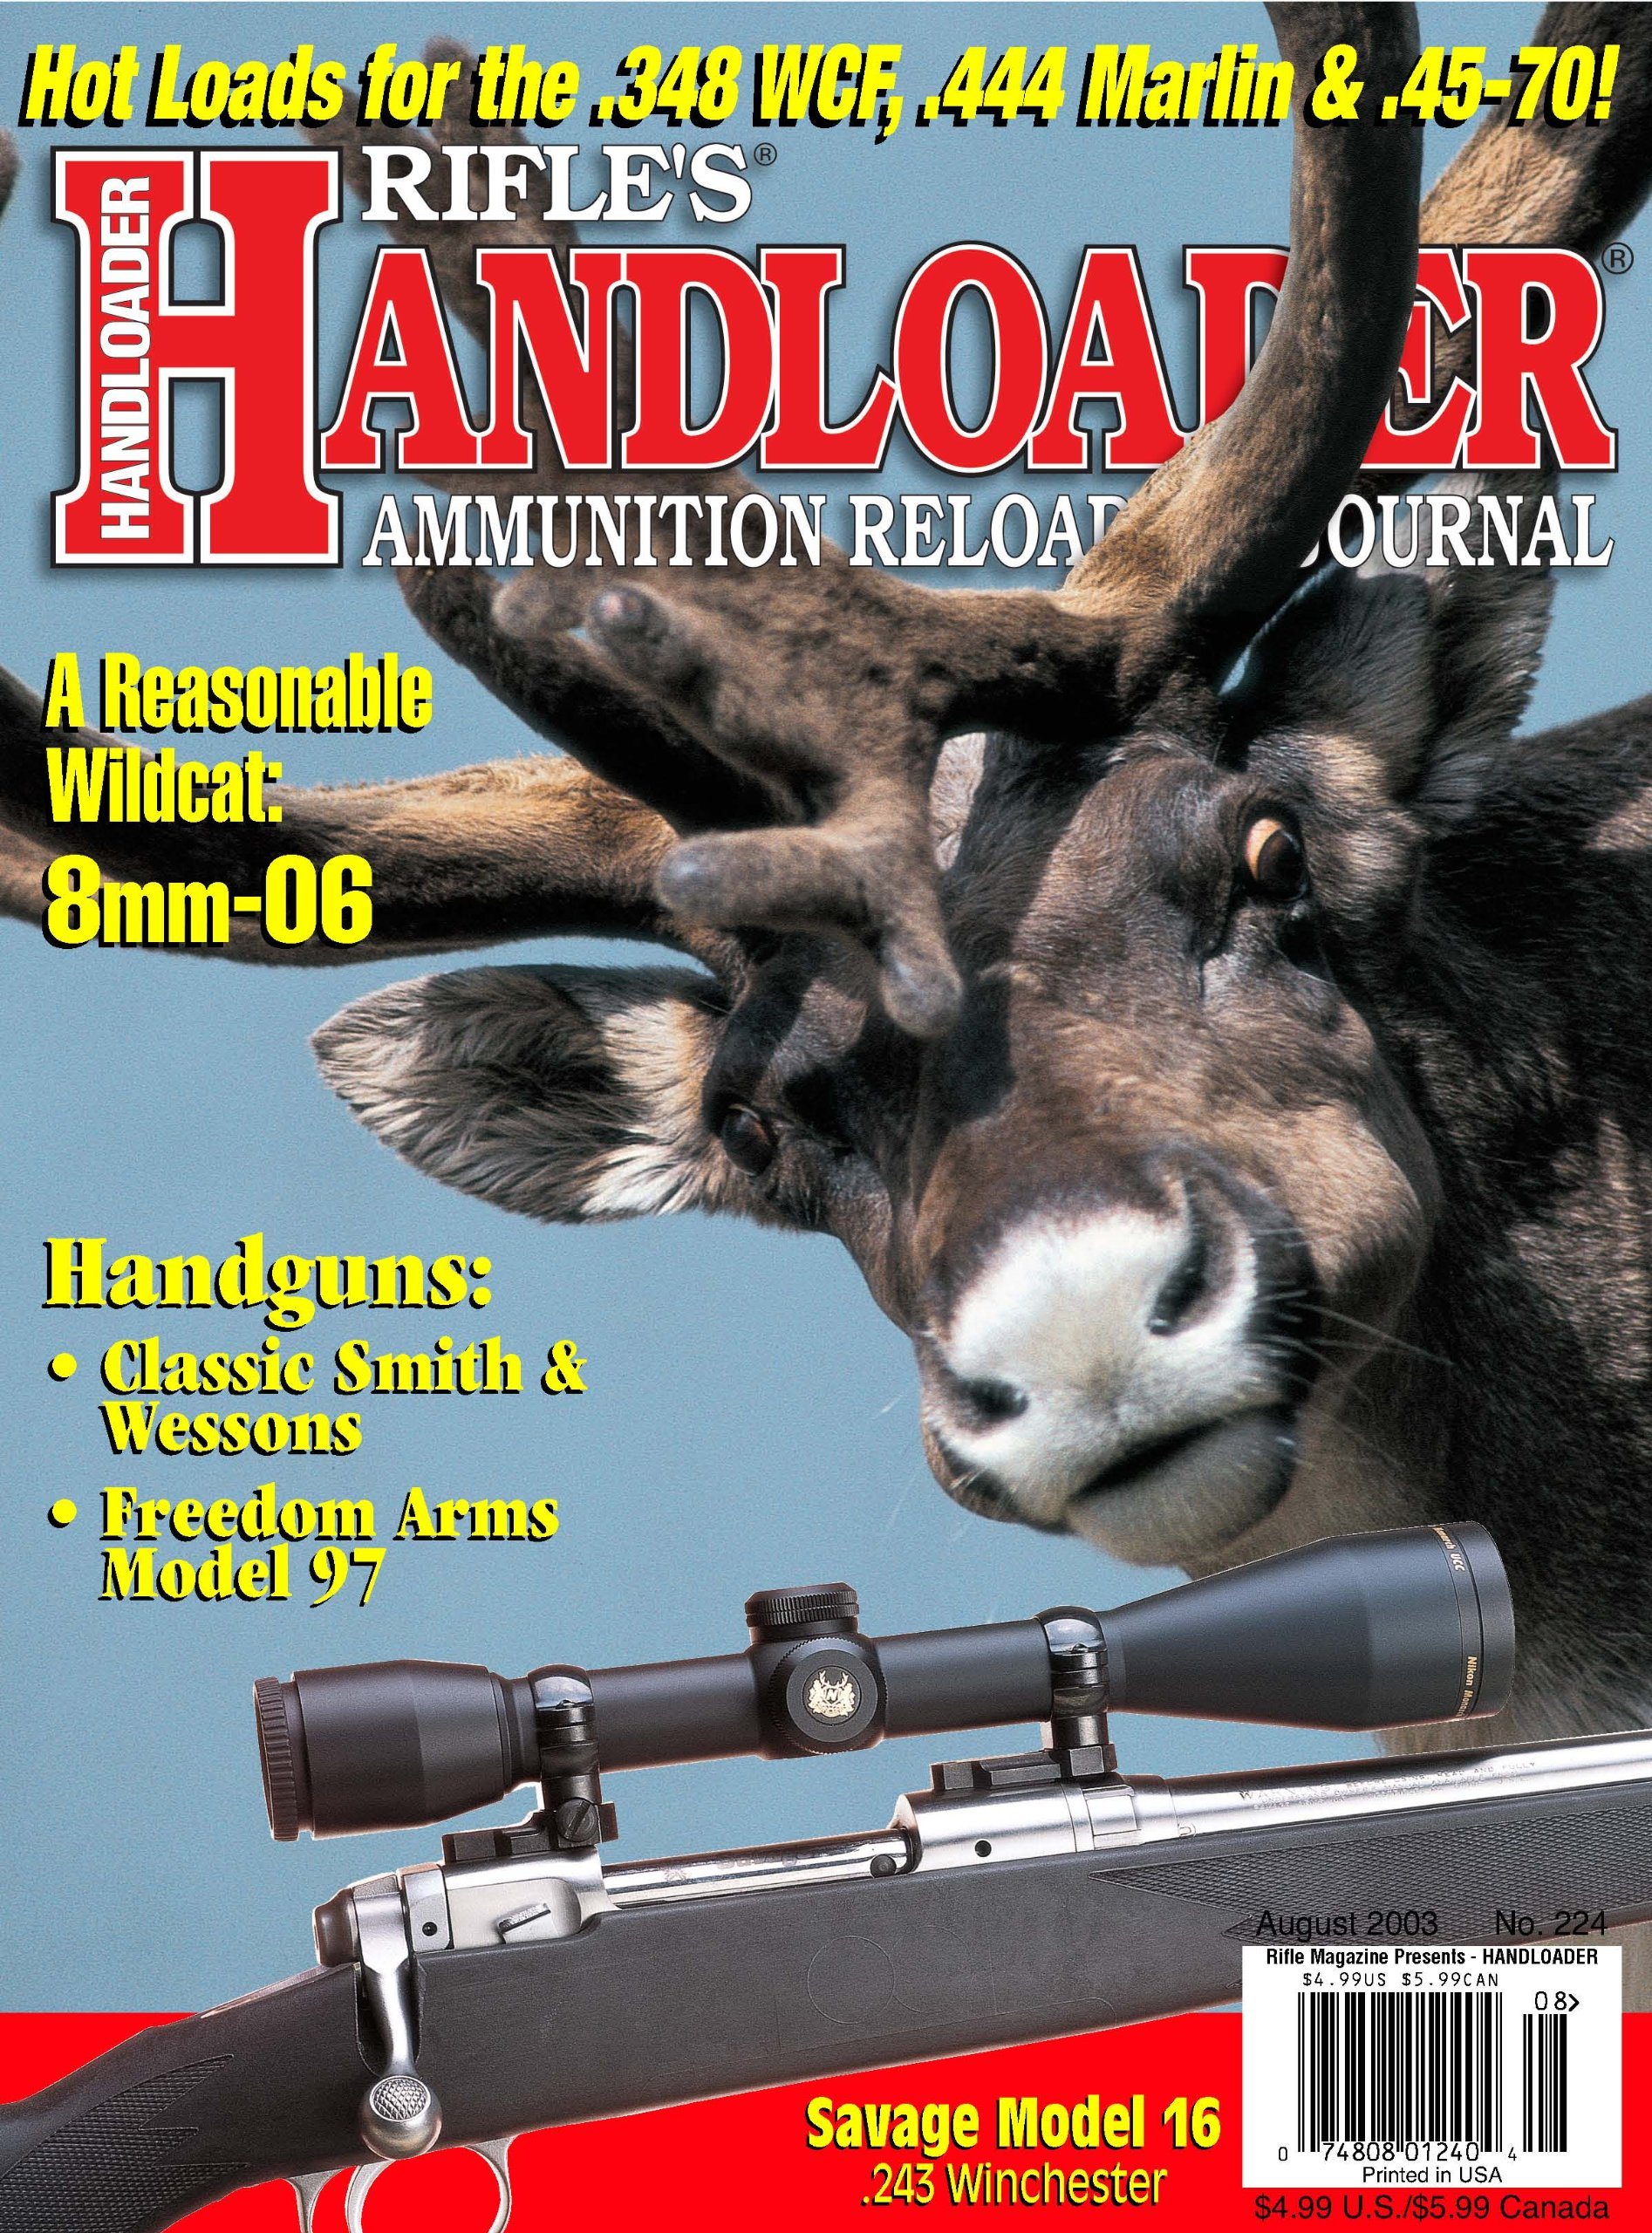 Download Handloader Magazine - August 2003 - Issue Number 224 ebook